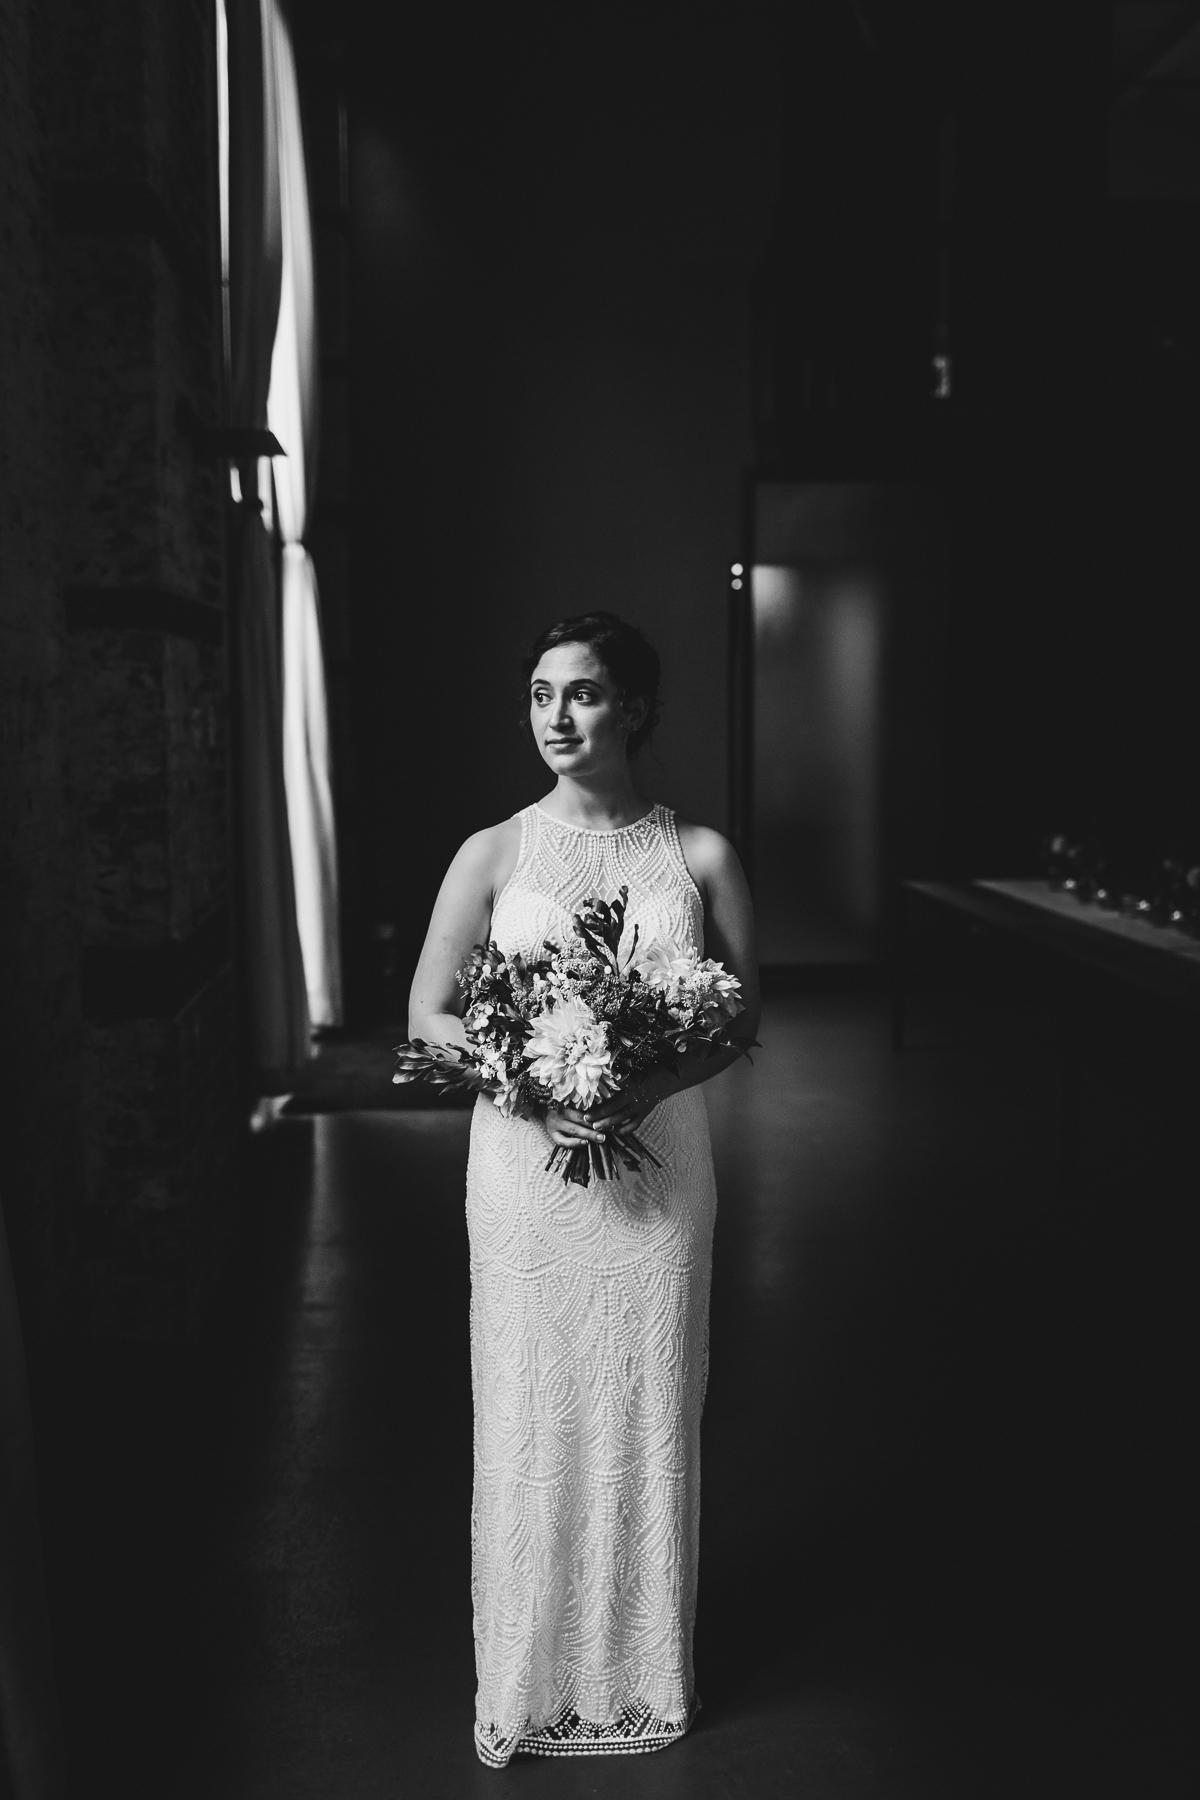 The-Green-Building-Jewish-Wedding-NYC-Brooklyn-Documentary-Wedding-Photographer-11.jpg